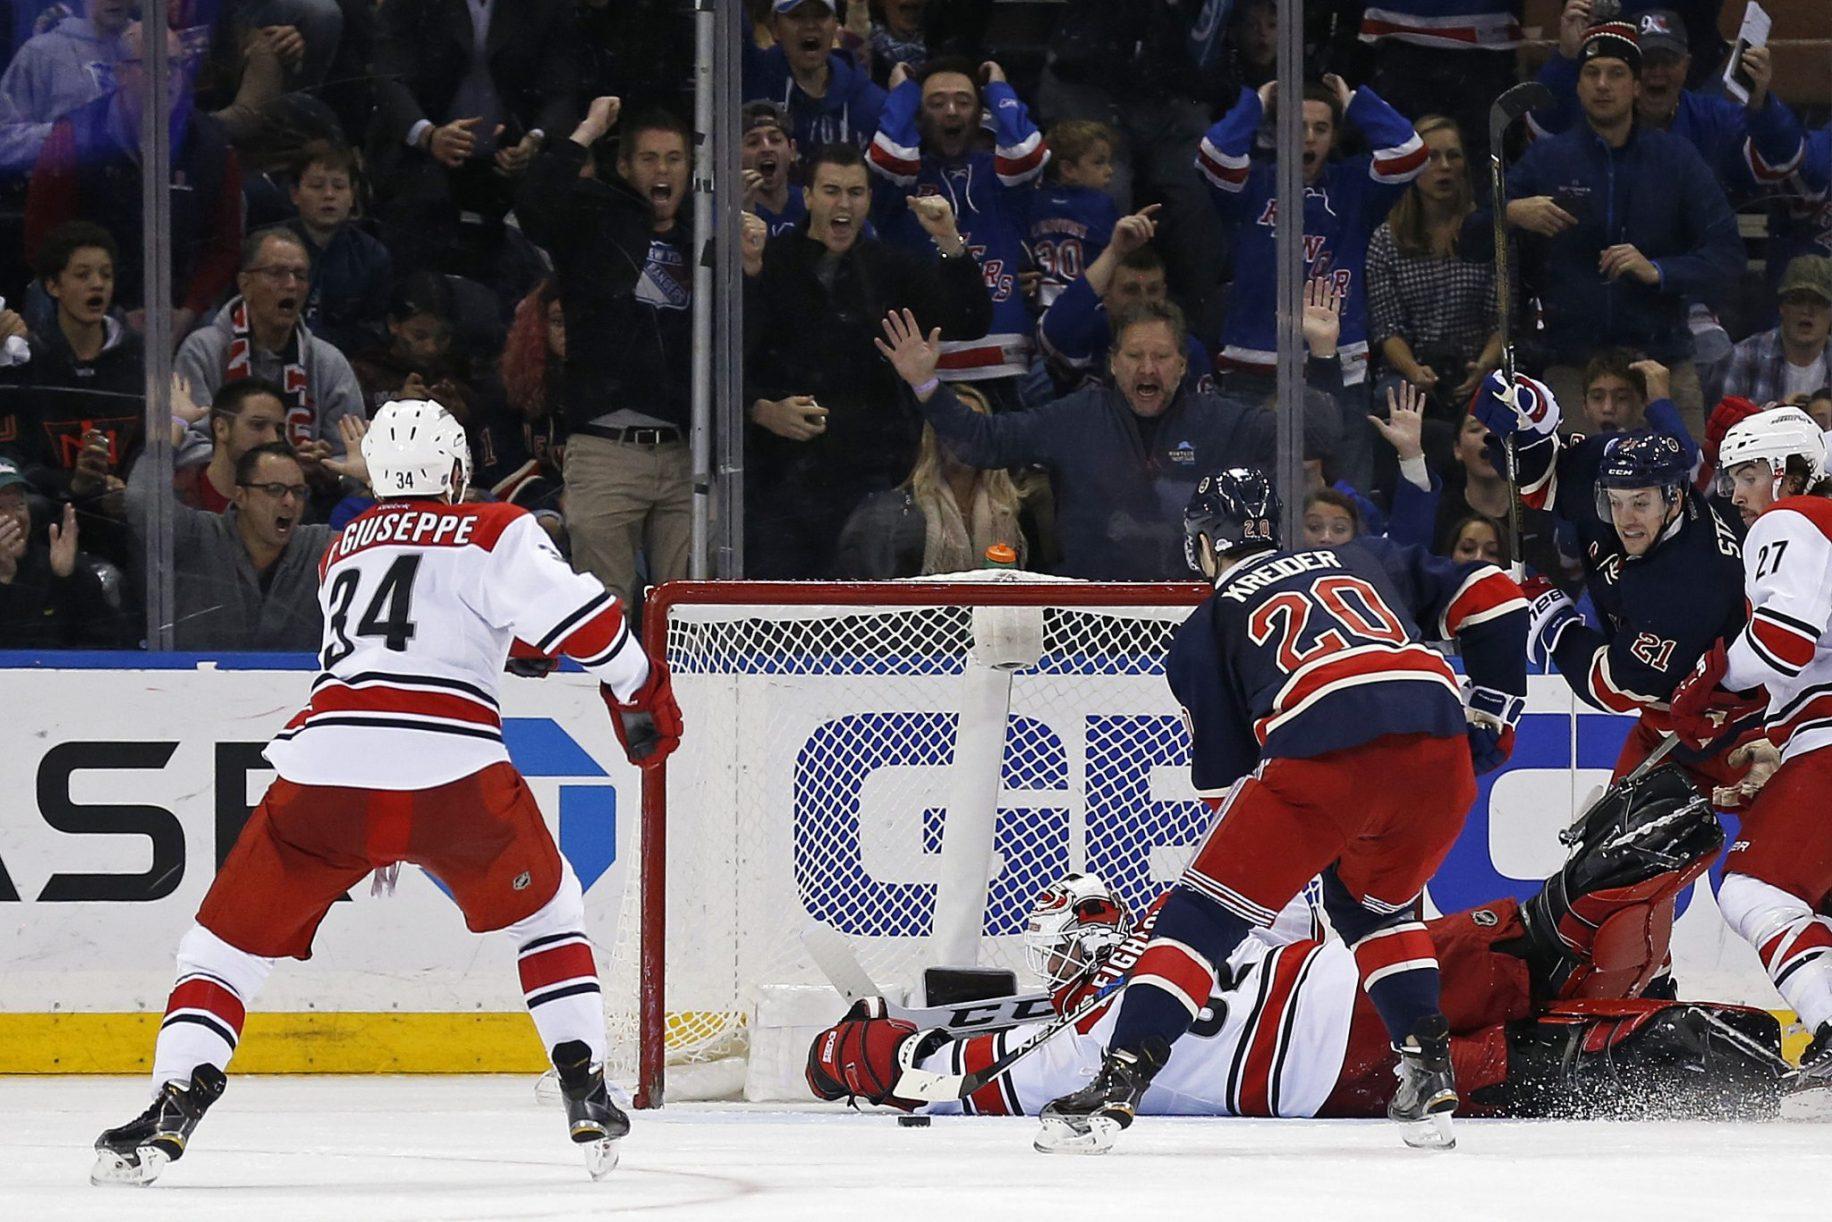 Chris Kreider's two goals lift the New York Rangers over the Hurricanes (Highlights) 2